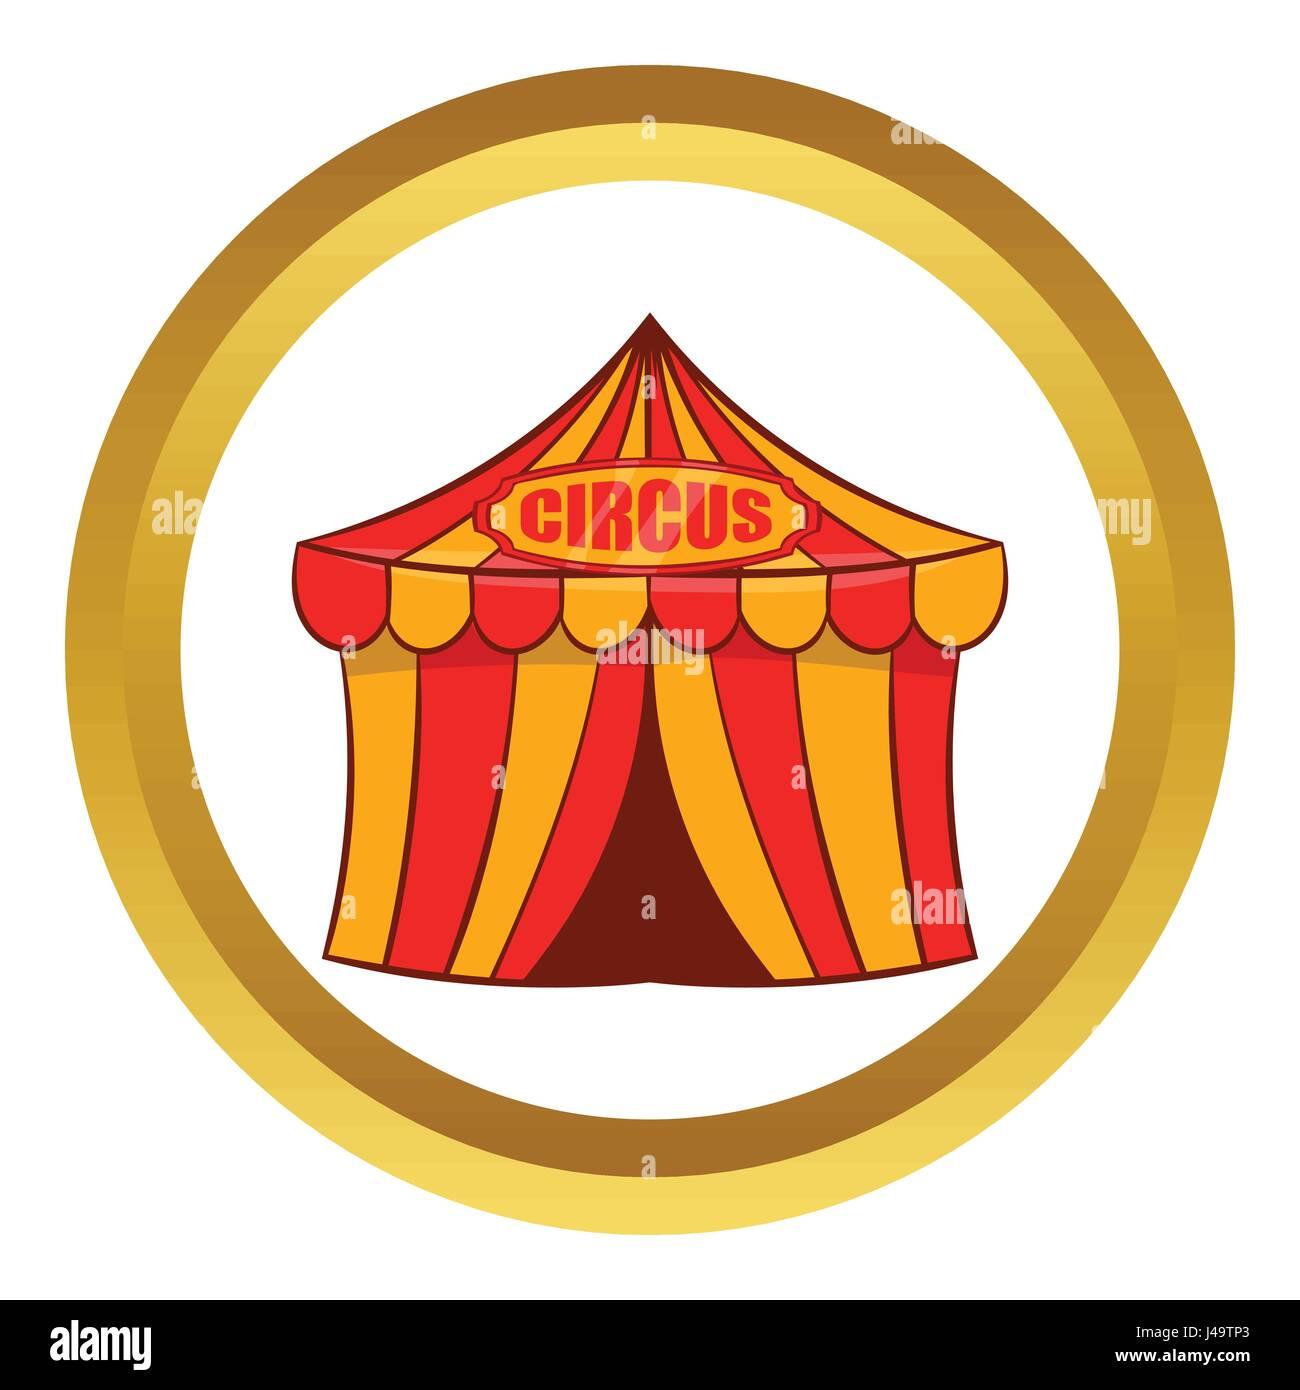 Circus tent vector icon, cartoon style - Stock Image